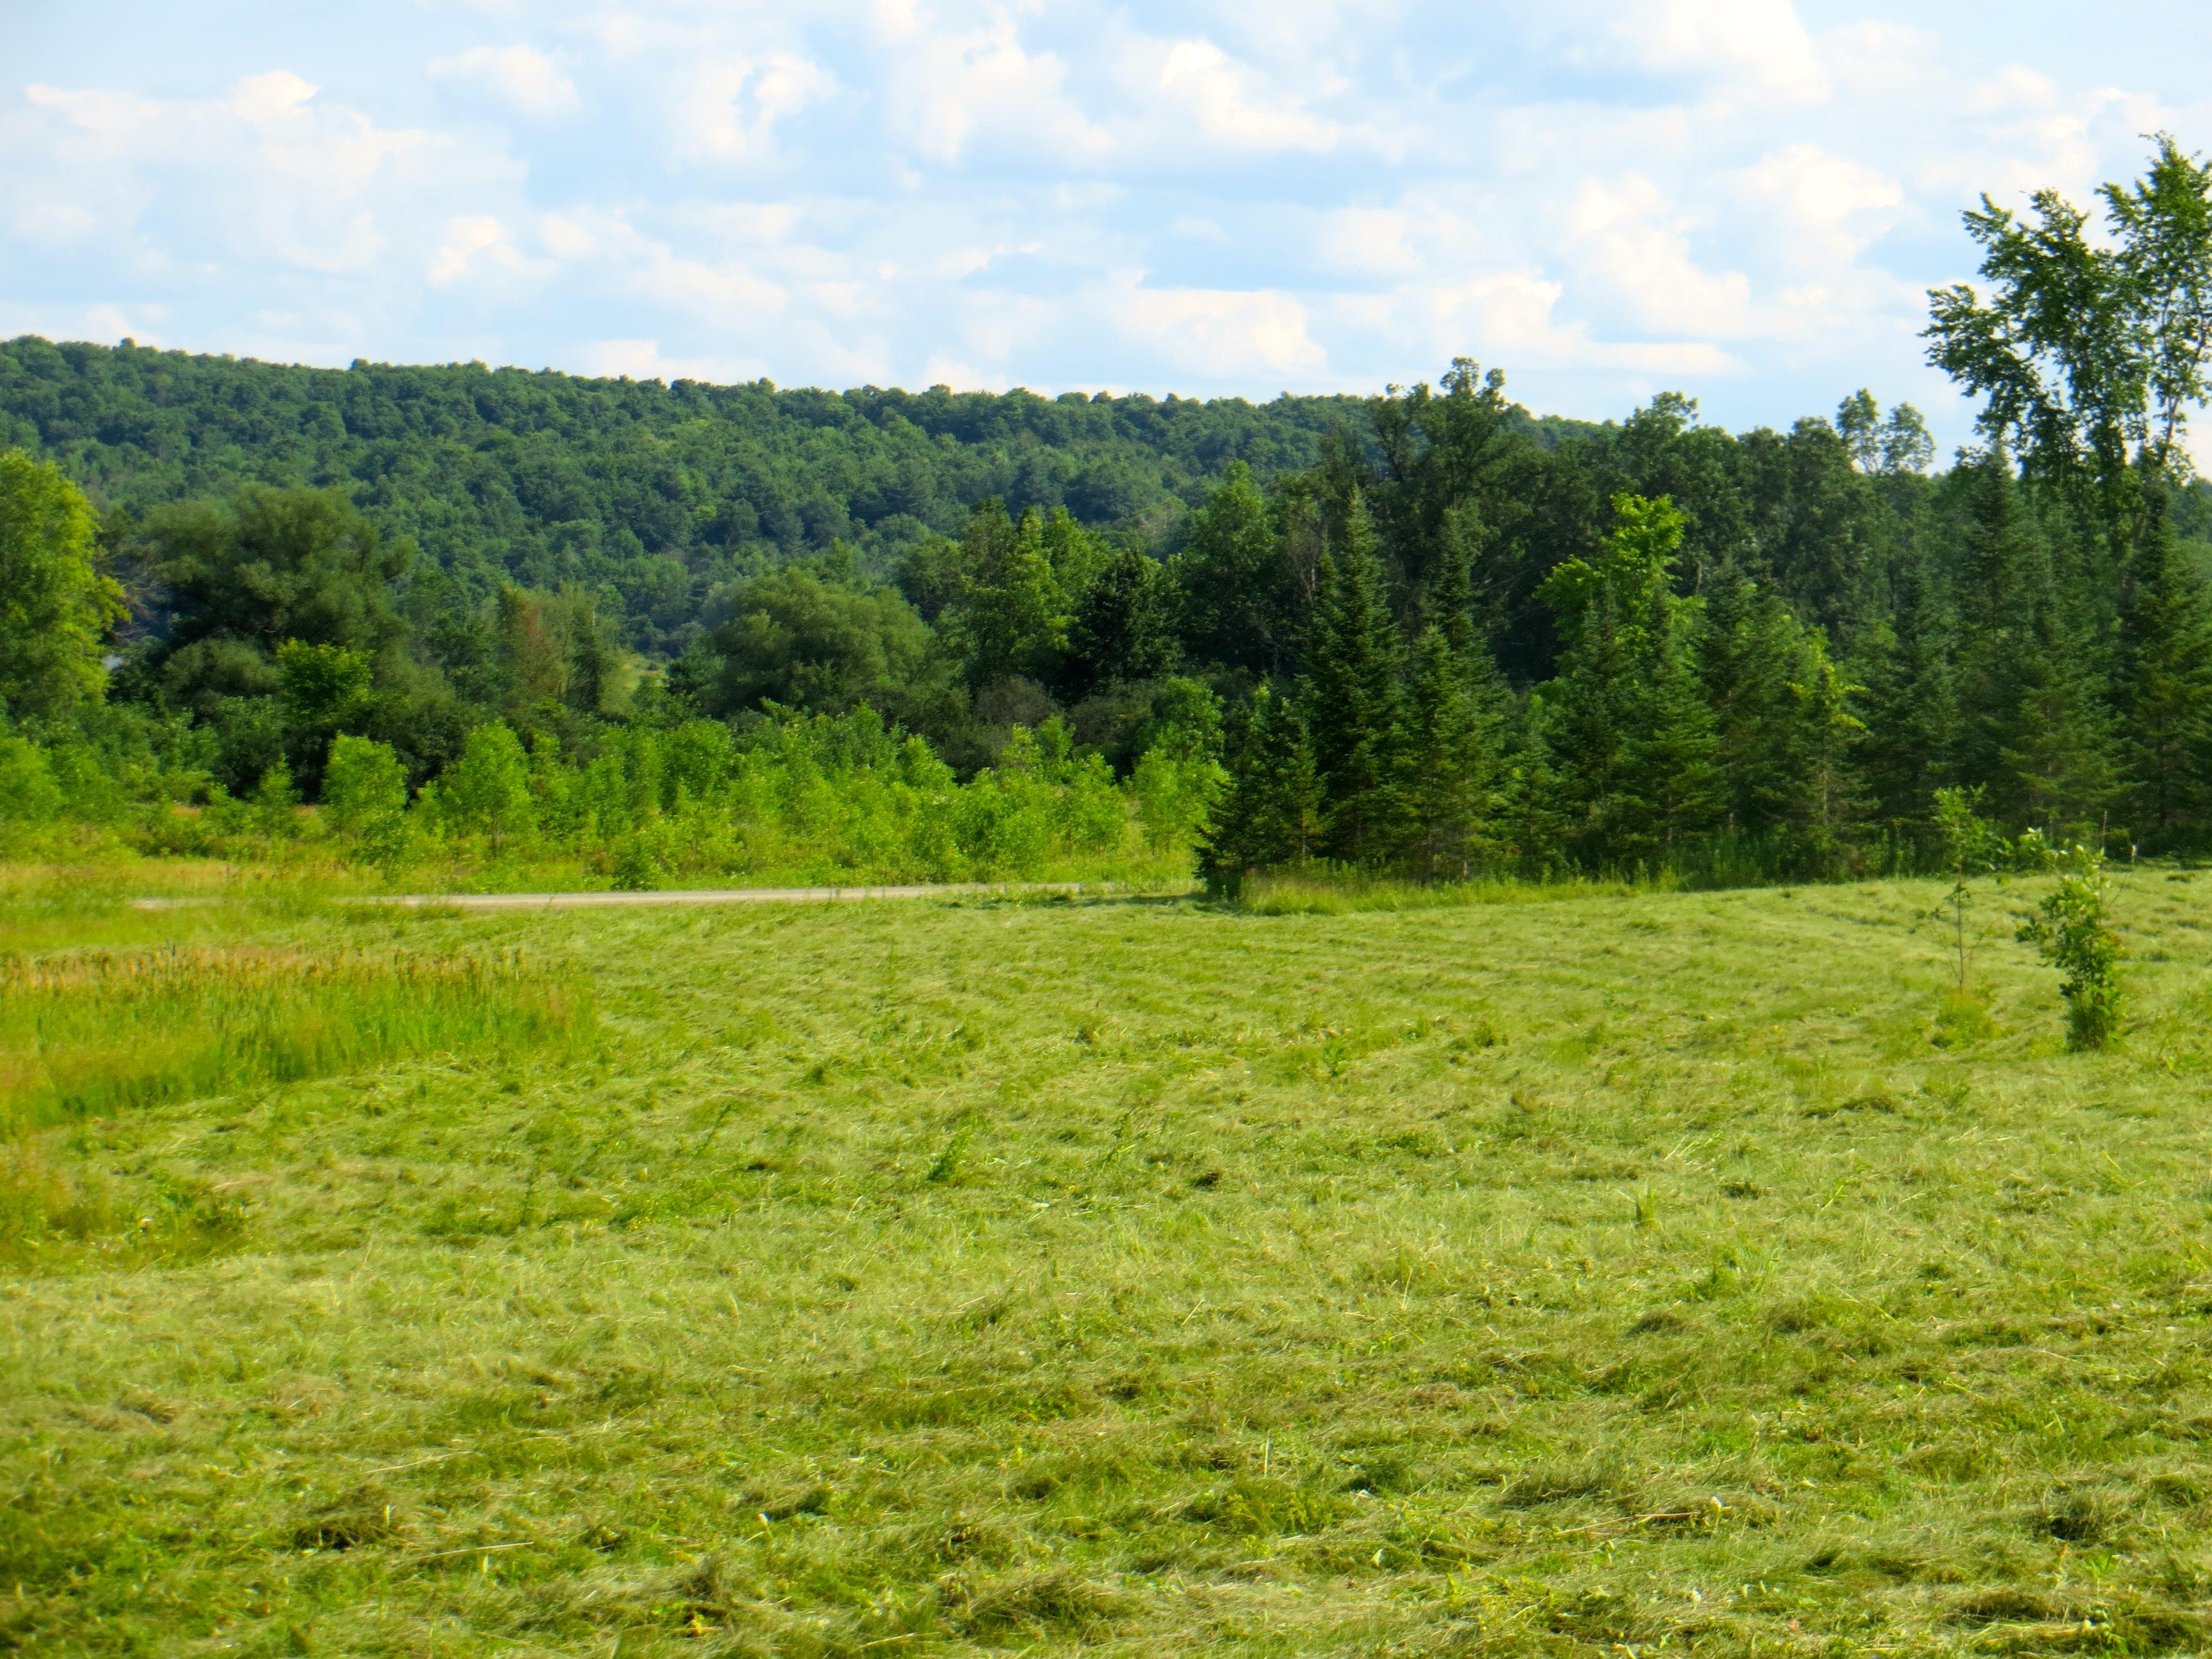 Upper field cut